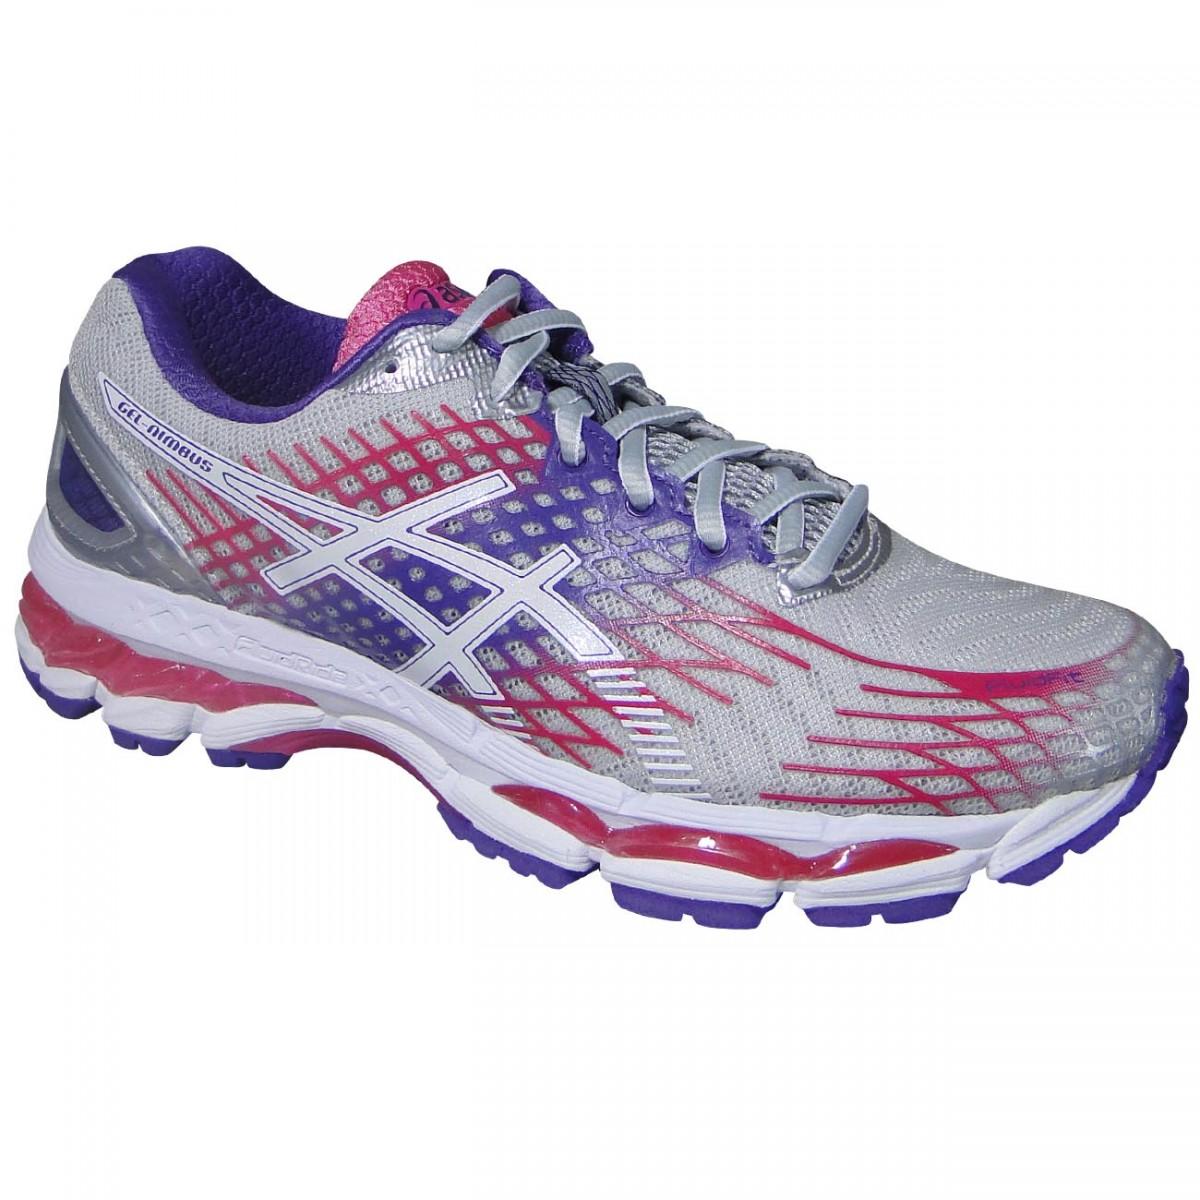 Tenis Asics Gel-Nimbus 17 T557N 9301 - Cinza Uva Pink - Chuteira ... 9ec38f0c2aa54